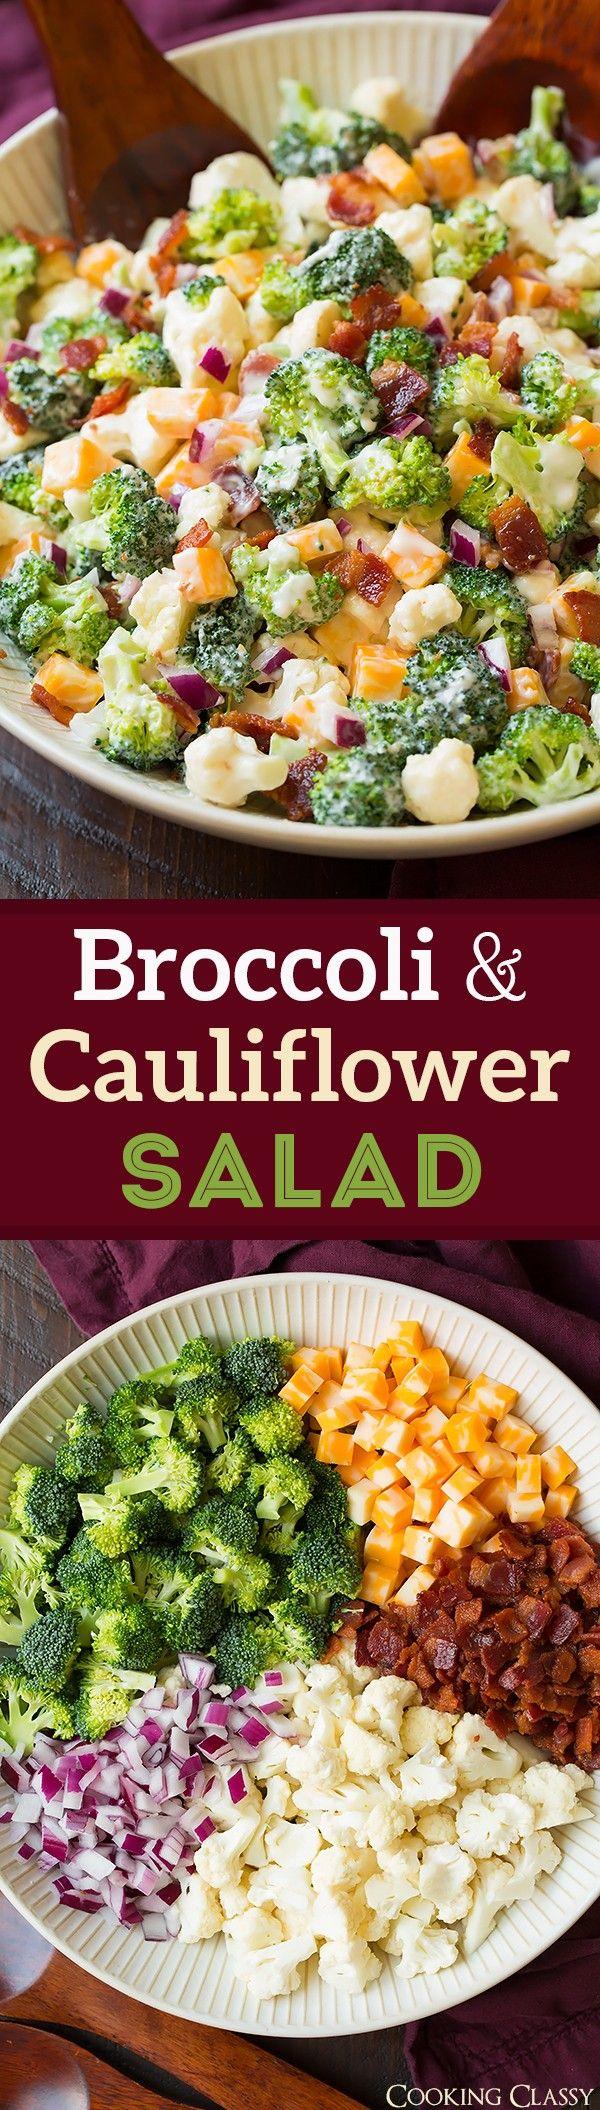 Obtenez la recette ♥ Salade de chou-fleur au brocoli #besttoeat #recipes_to_go